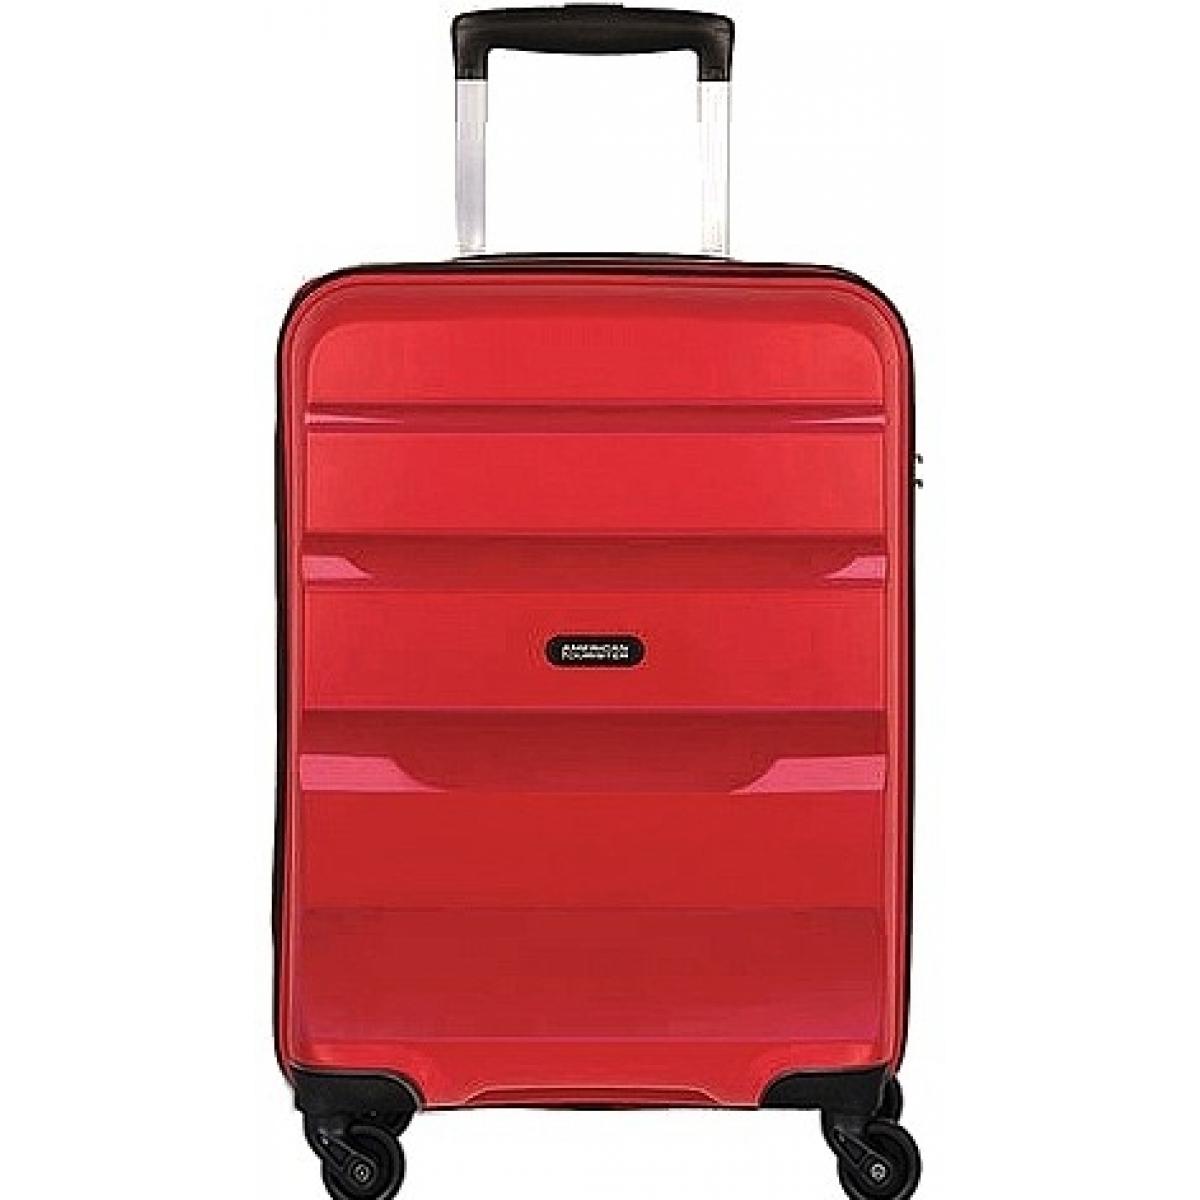 valise cabine bon air american tourister 55cm bonair22 couleur principale rouge valise. Black Bedroom Furniture Sets. Home Design Ideas